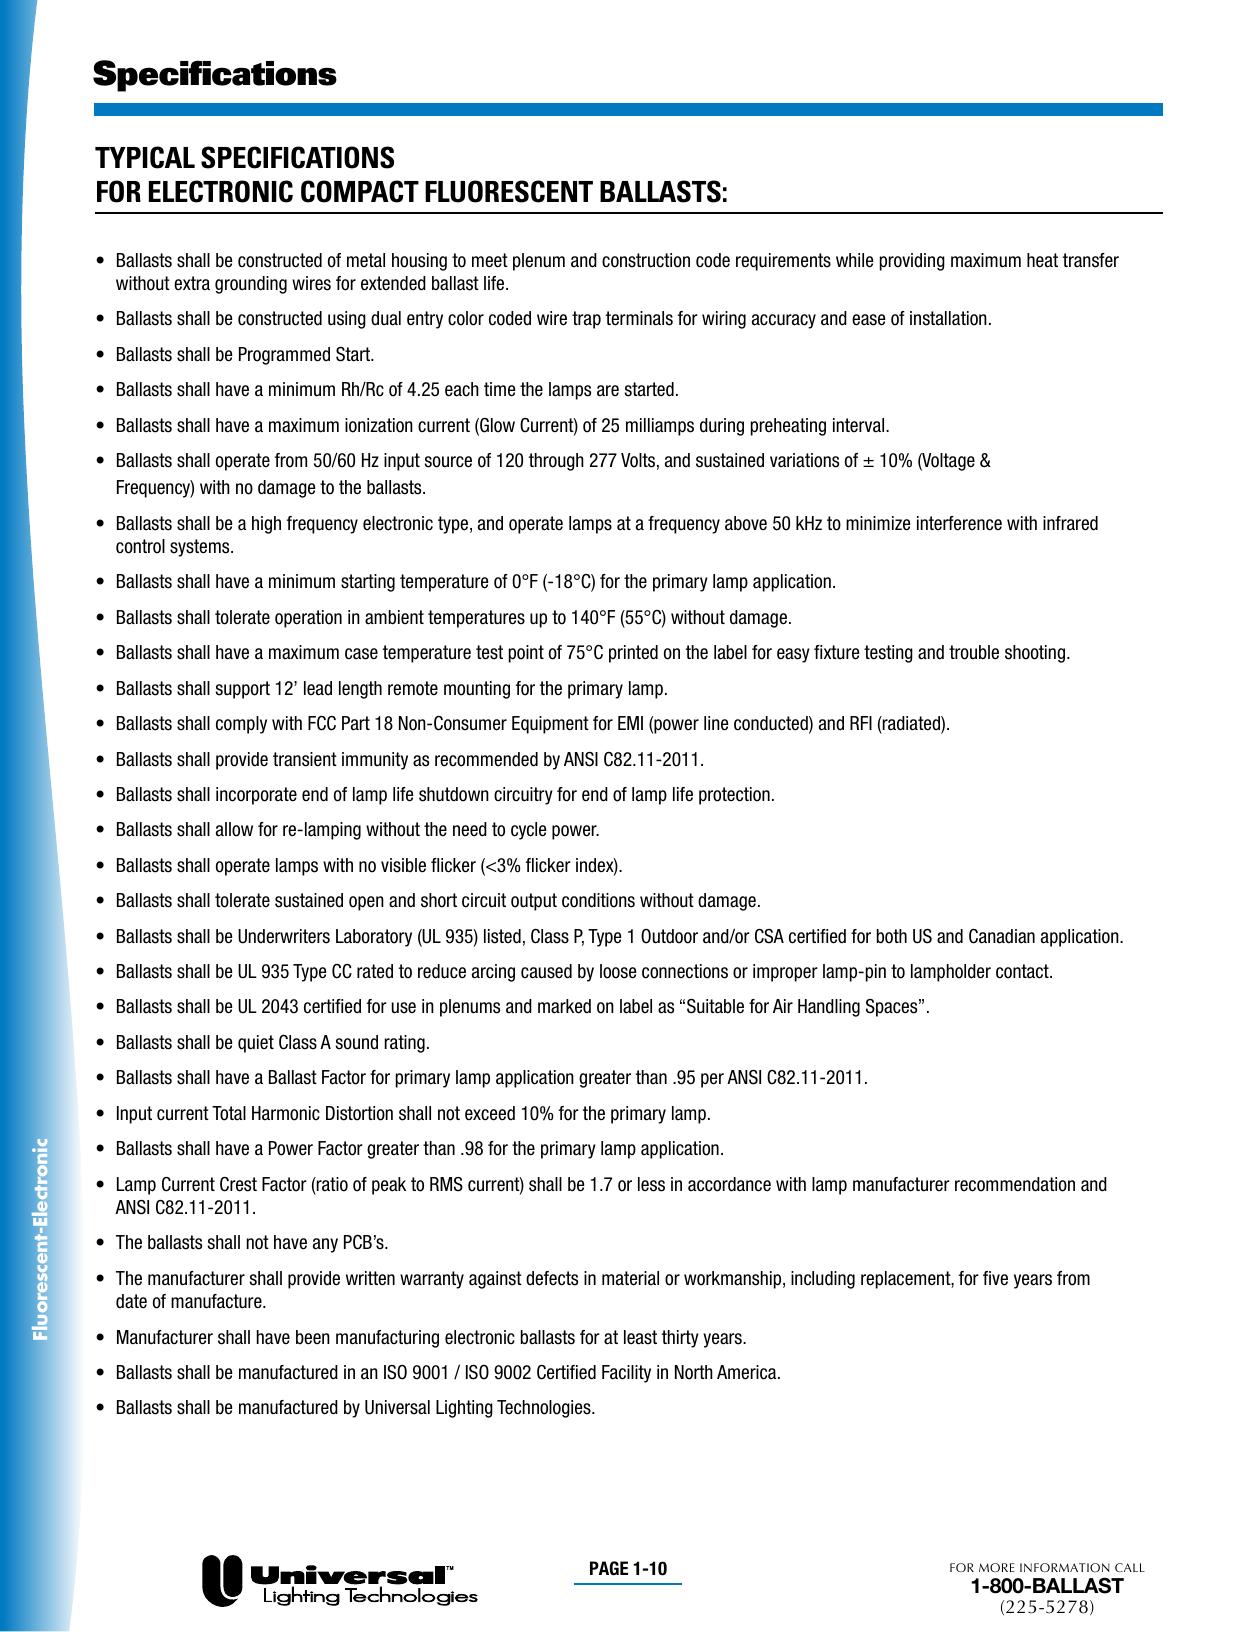 10 Pieces Universal C2642UNVMES Compact Fluorescent 2L 26W 120//277 BOTTOM STUDS